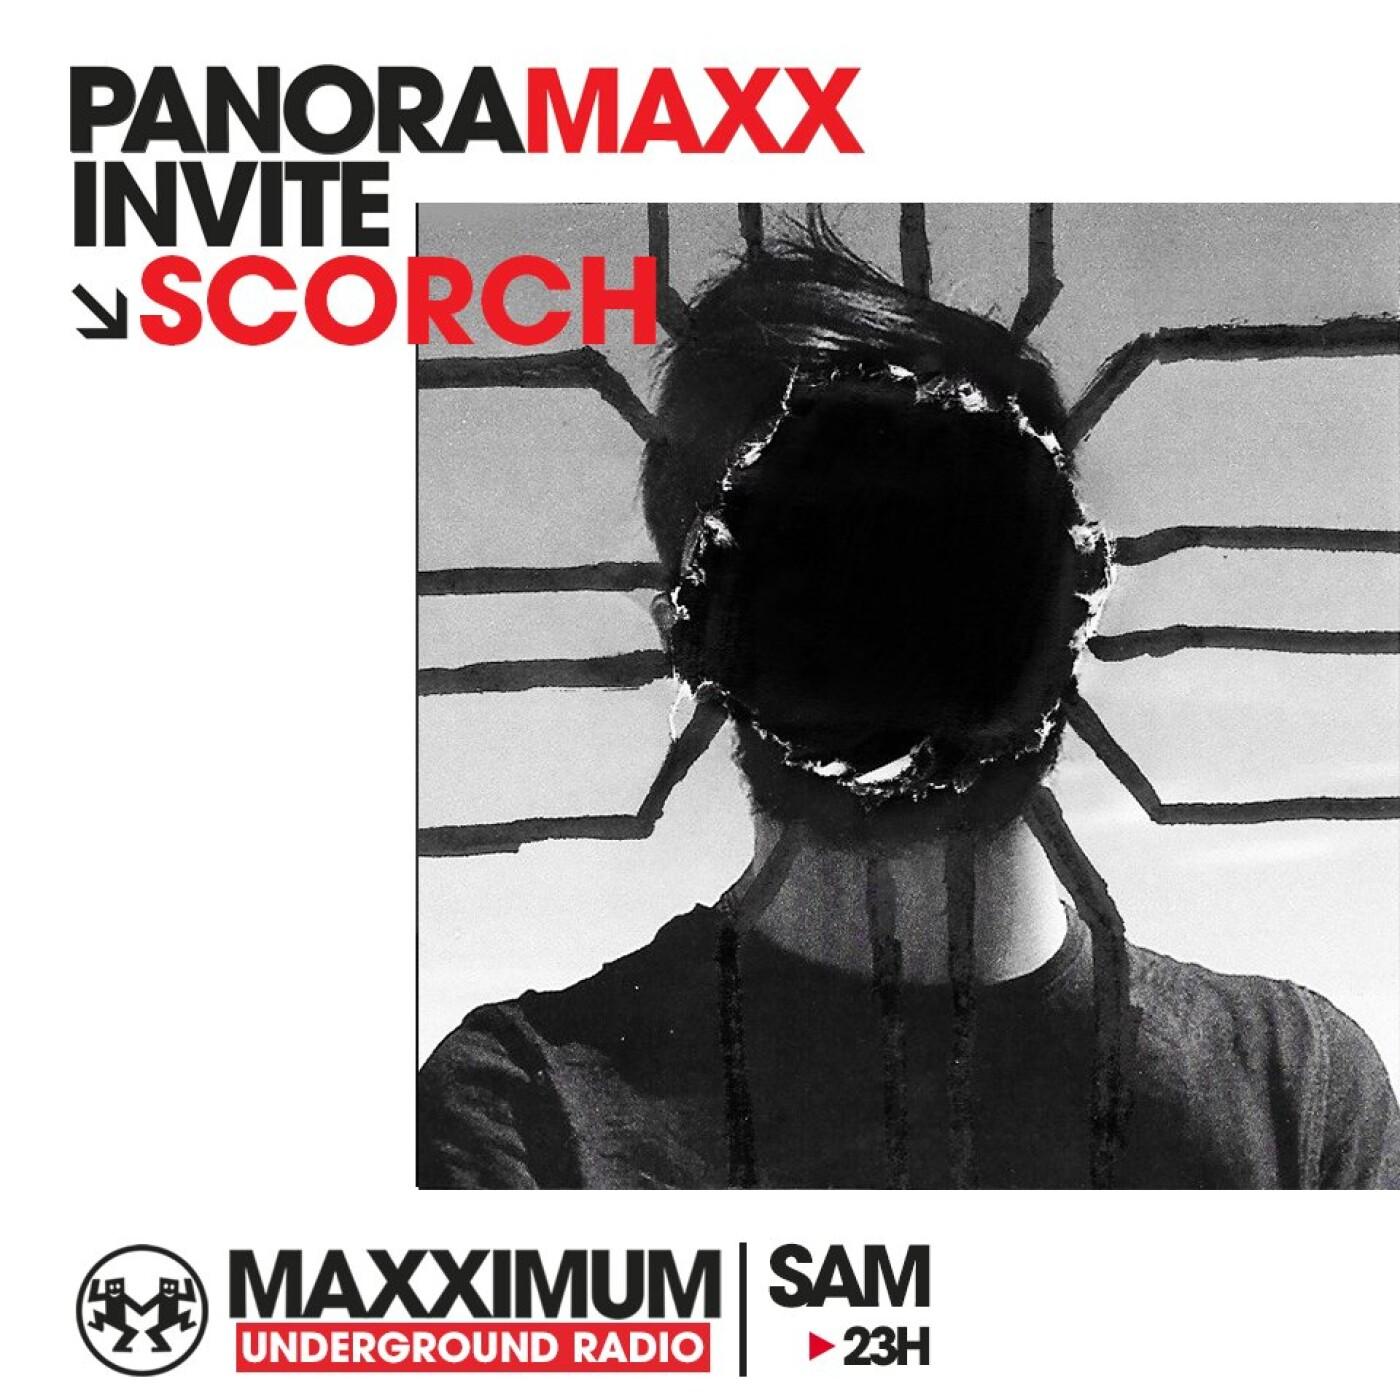 PANORAMAXX : SCORCH